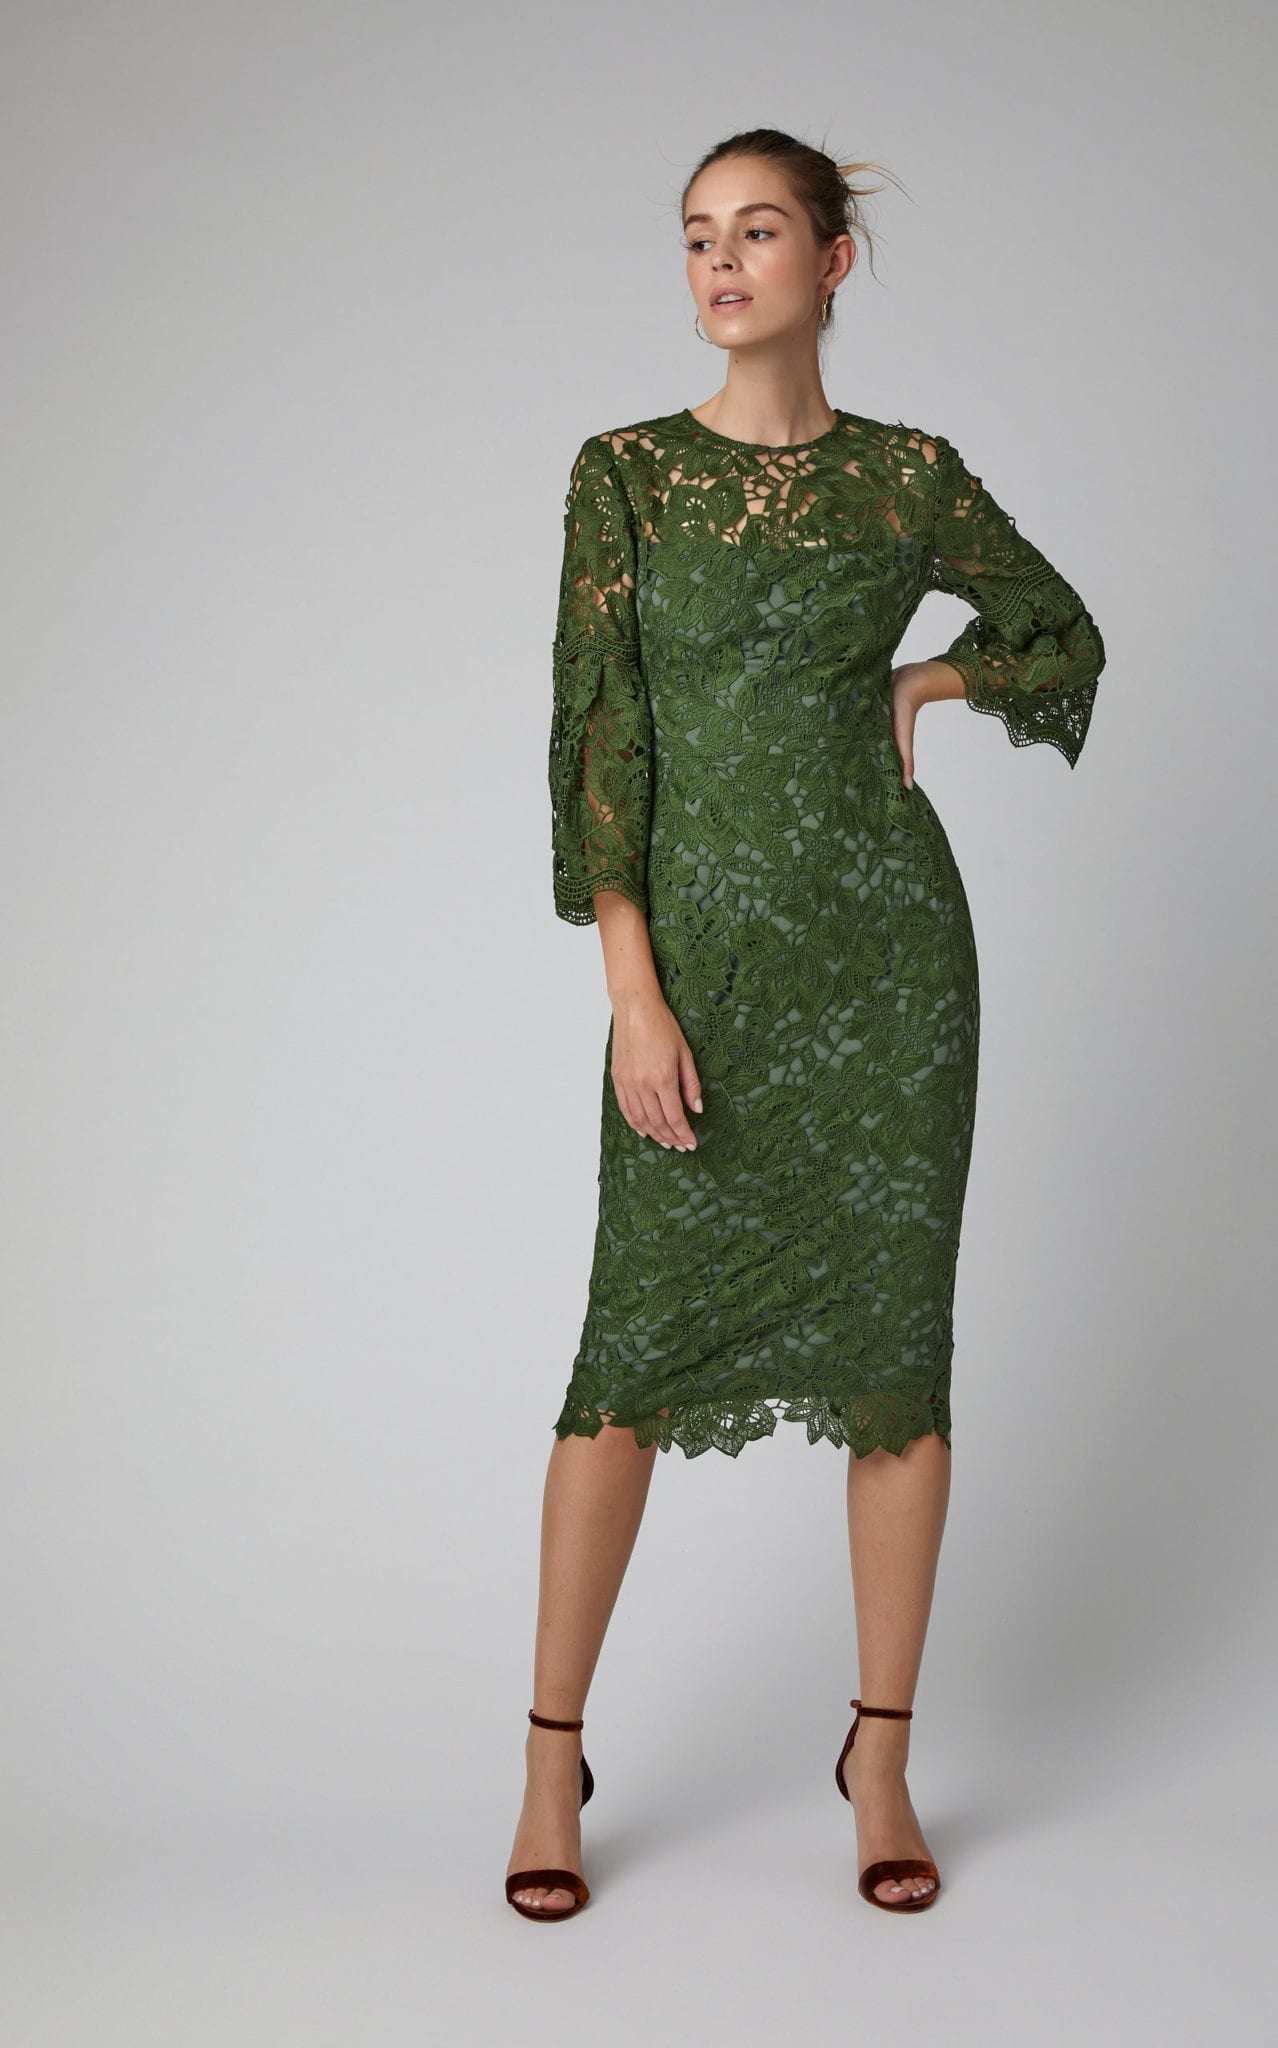 Lela Rose Corded Lace Midi Green Dress